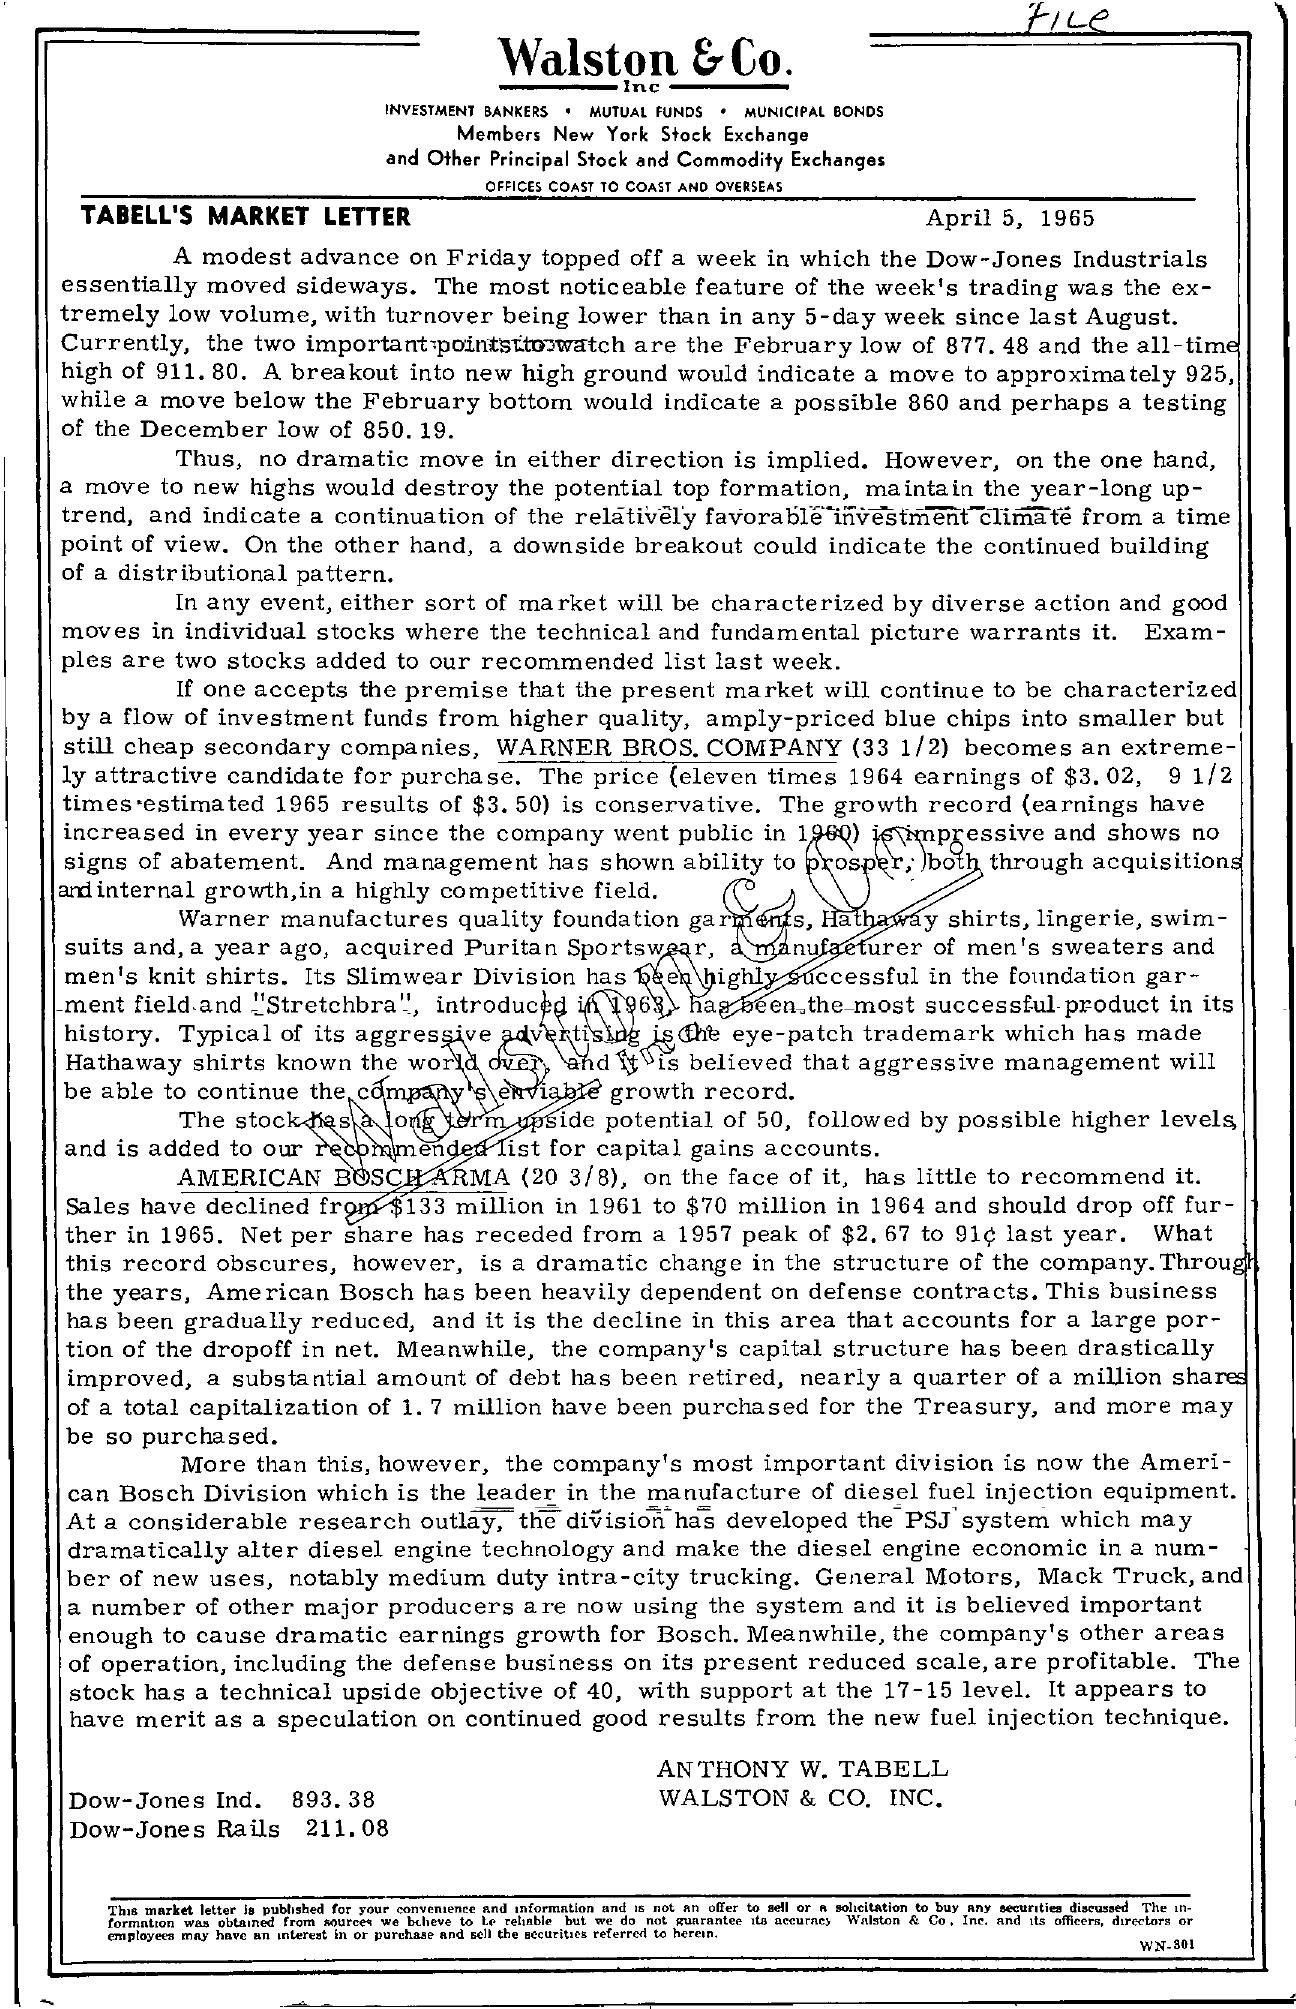 Tabell's Market Letter - April 05, 1965